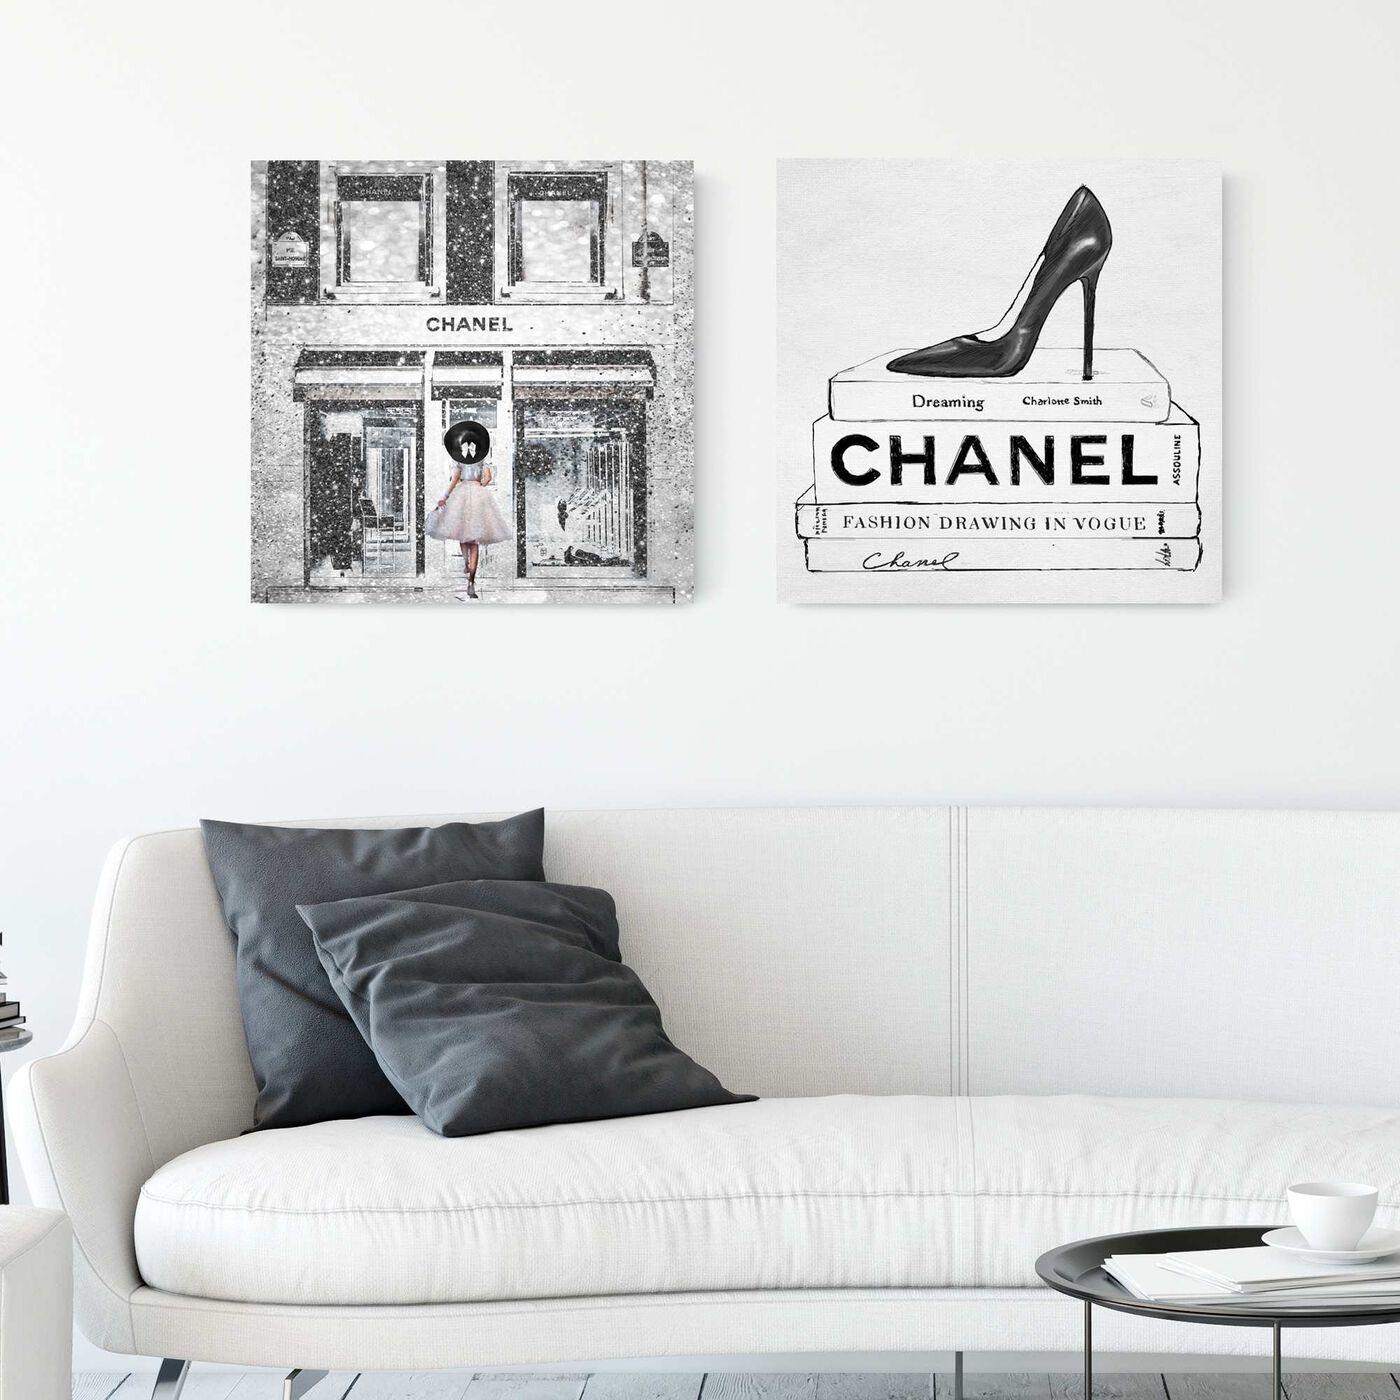 My Favorite Store Set